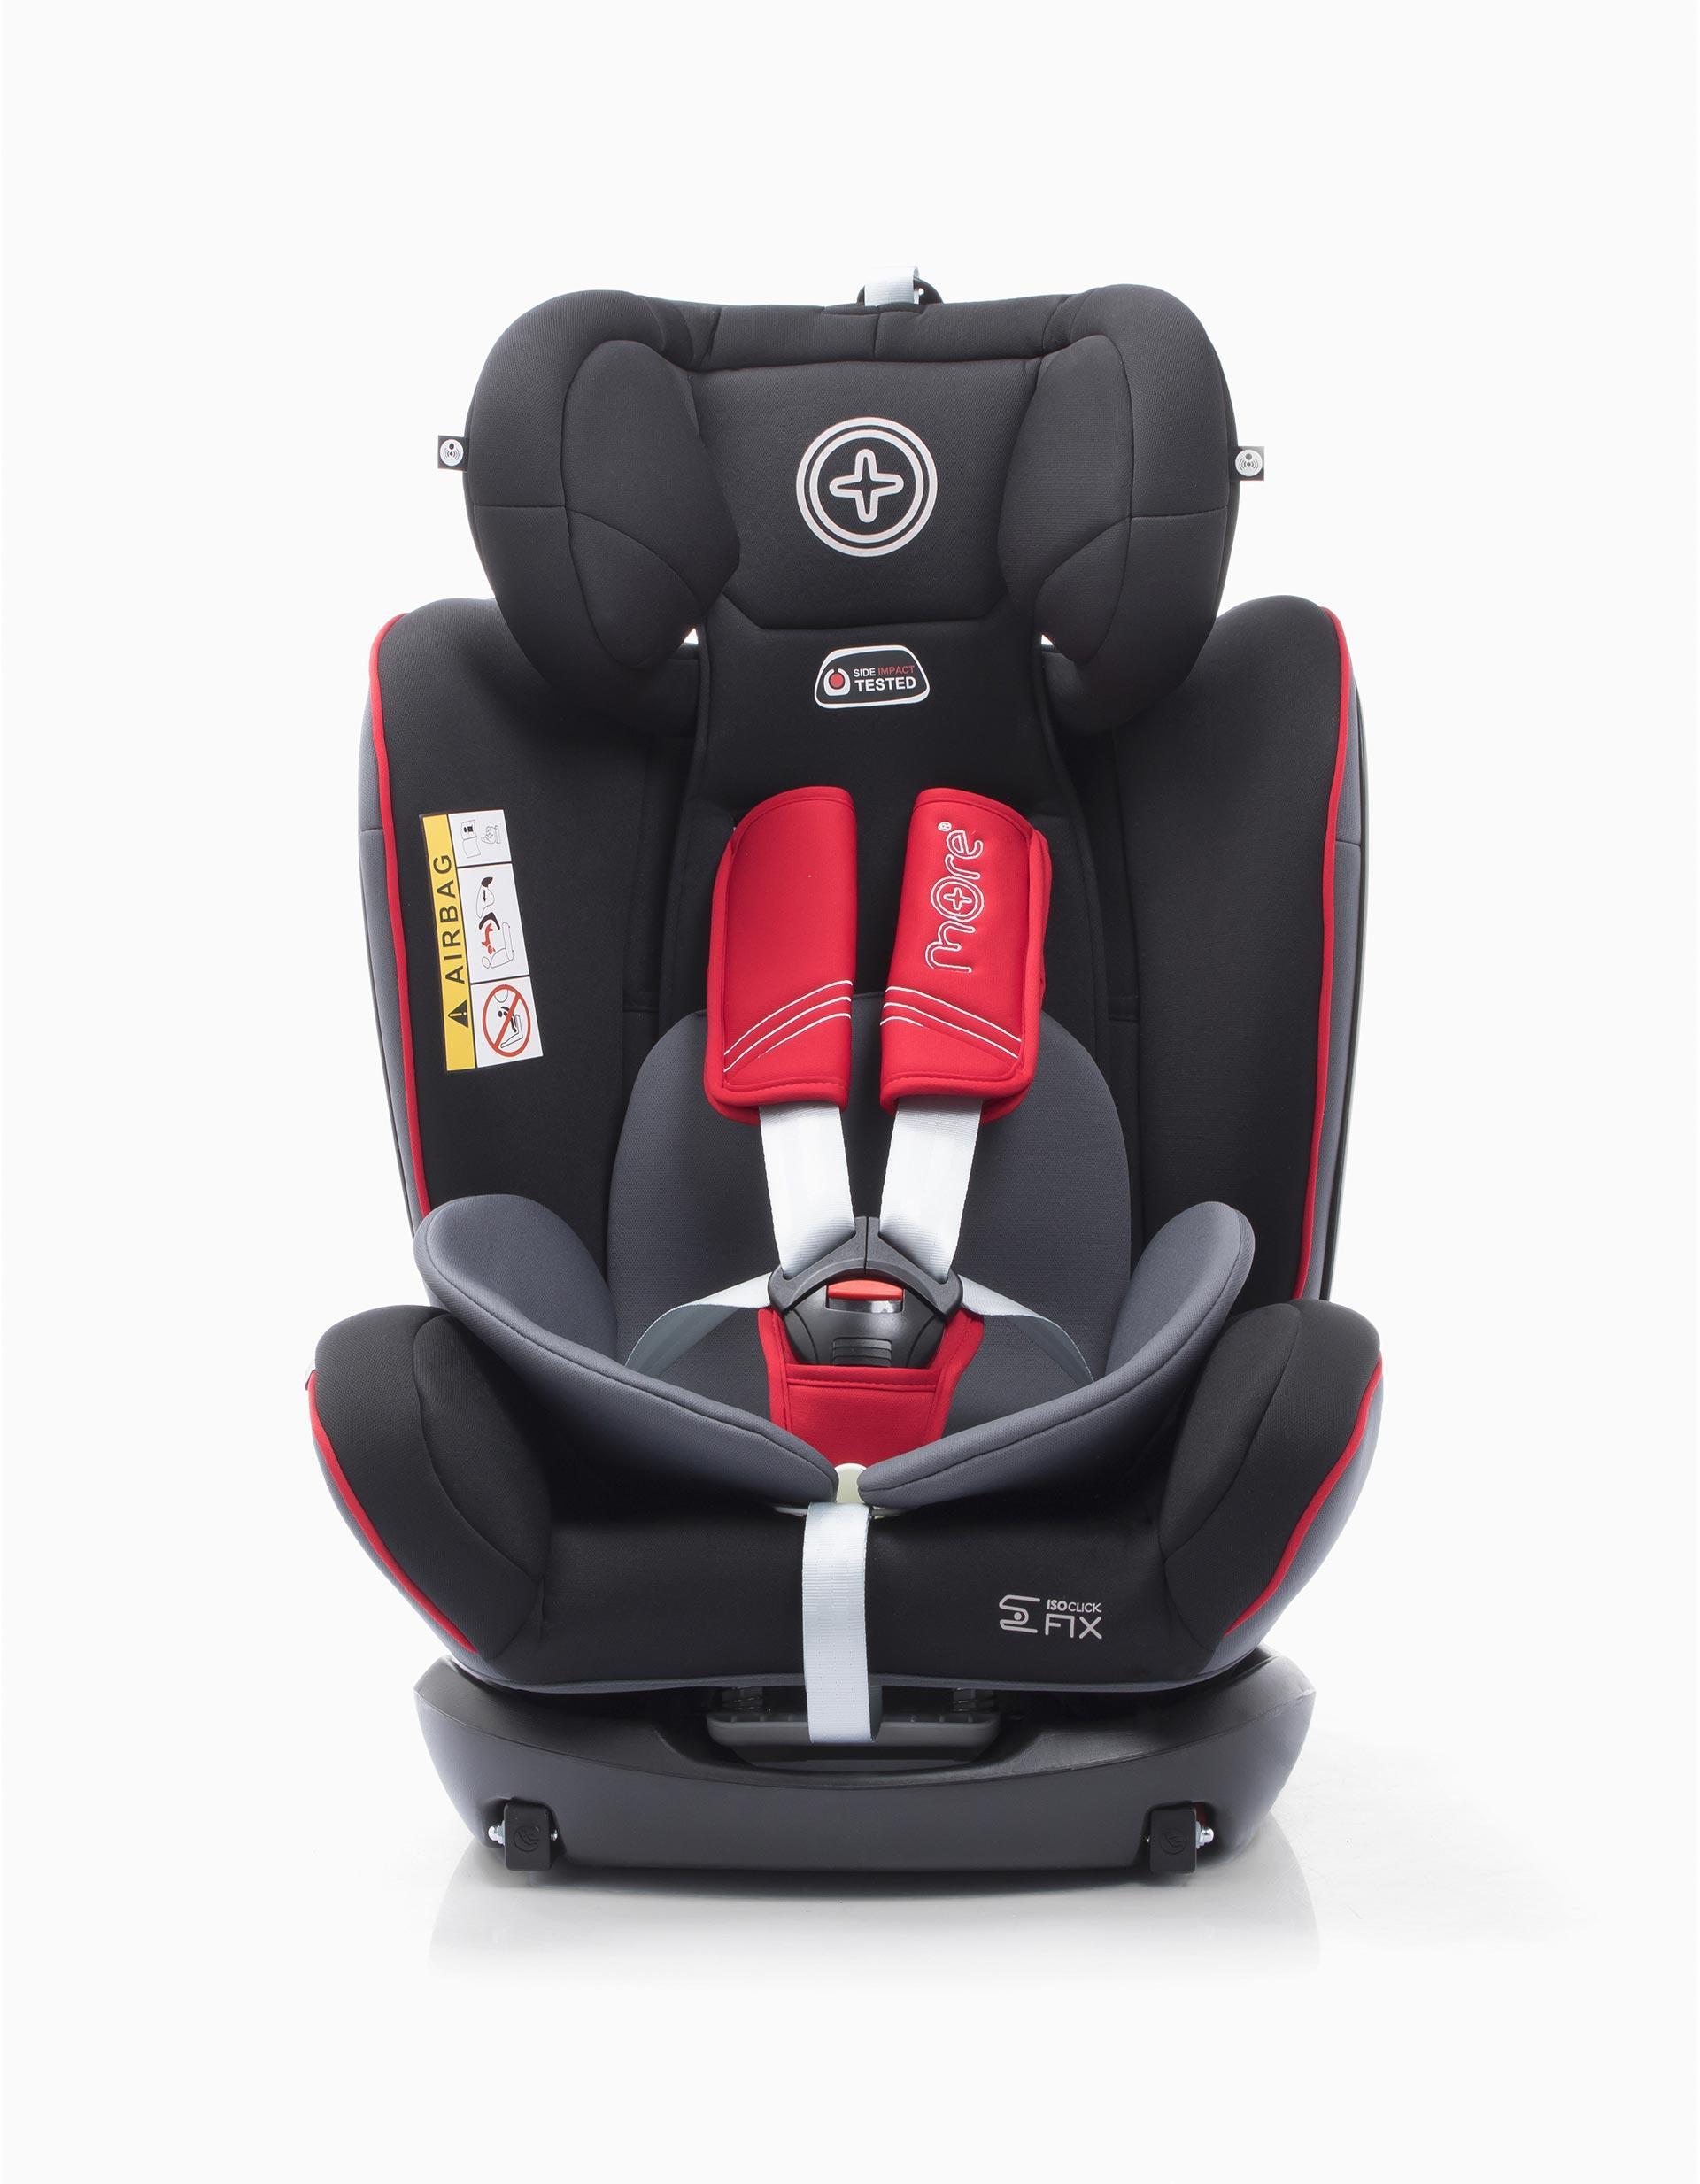 Kindersitz Babyauto 8436015311718 Erfahrung